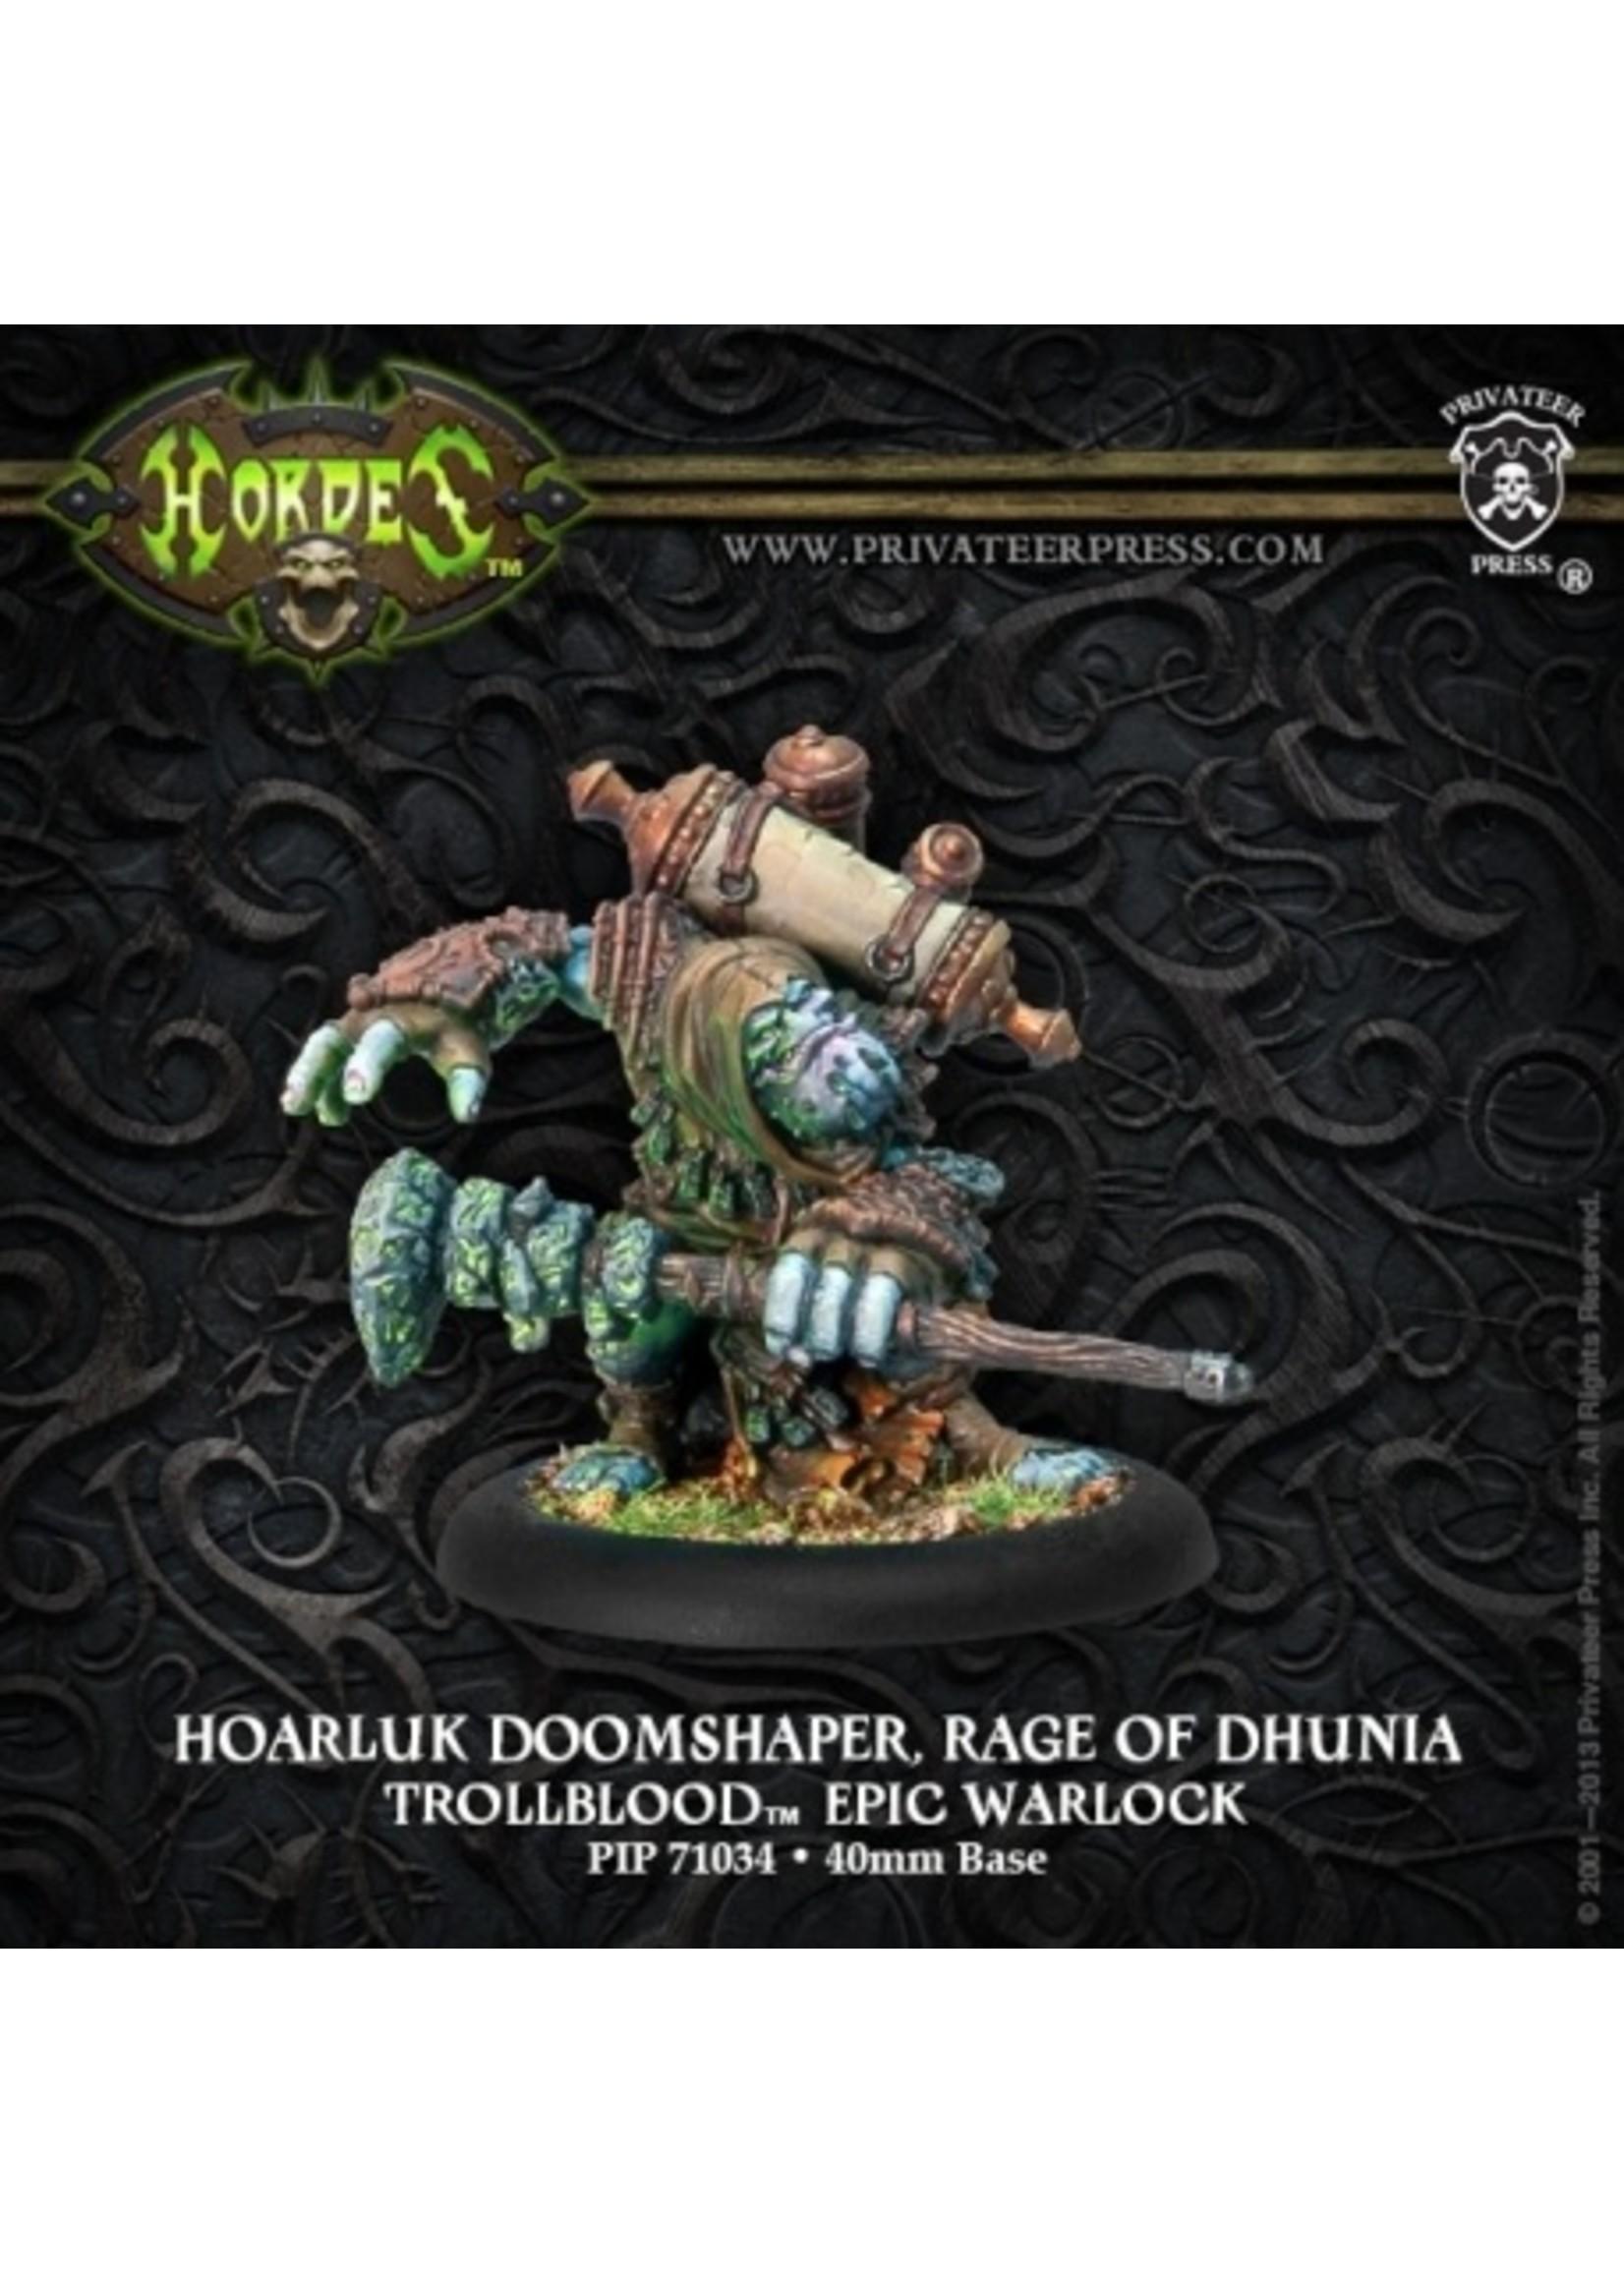 Hordes: Trollblood Hoarluk Doomshaper, Rage of Dhunia Trollkin Epic Warlock (White Metal)